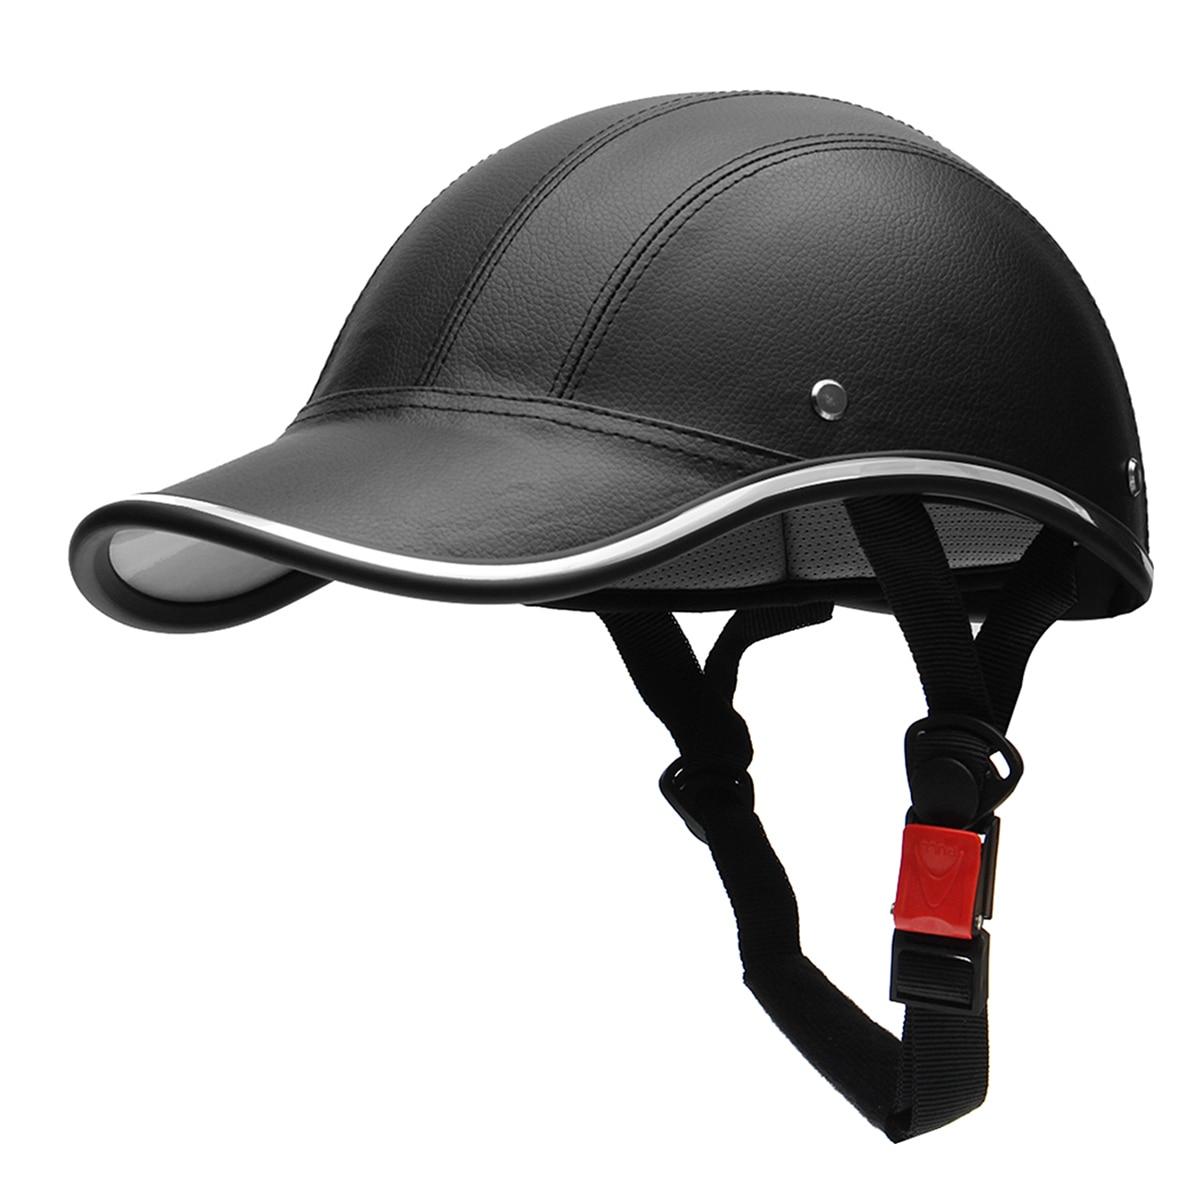 Motocicleta medio casco gorra de béisbol StyleHalf casco bicicleta eléctrica Scooter seguridad anti-ultravioleta del sombrero duro